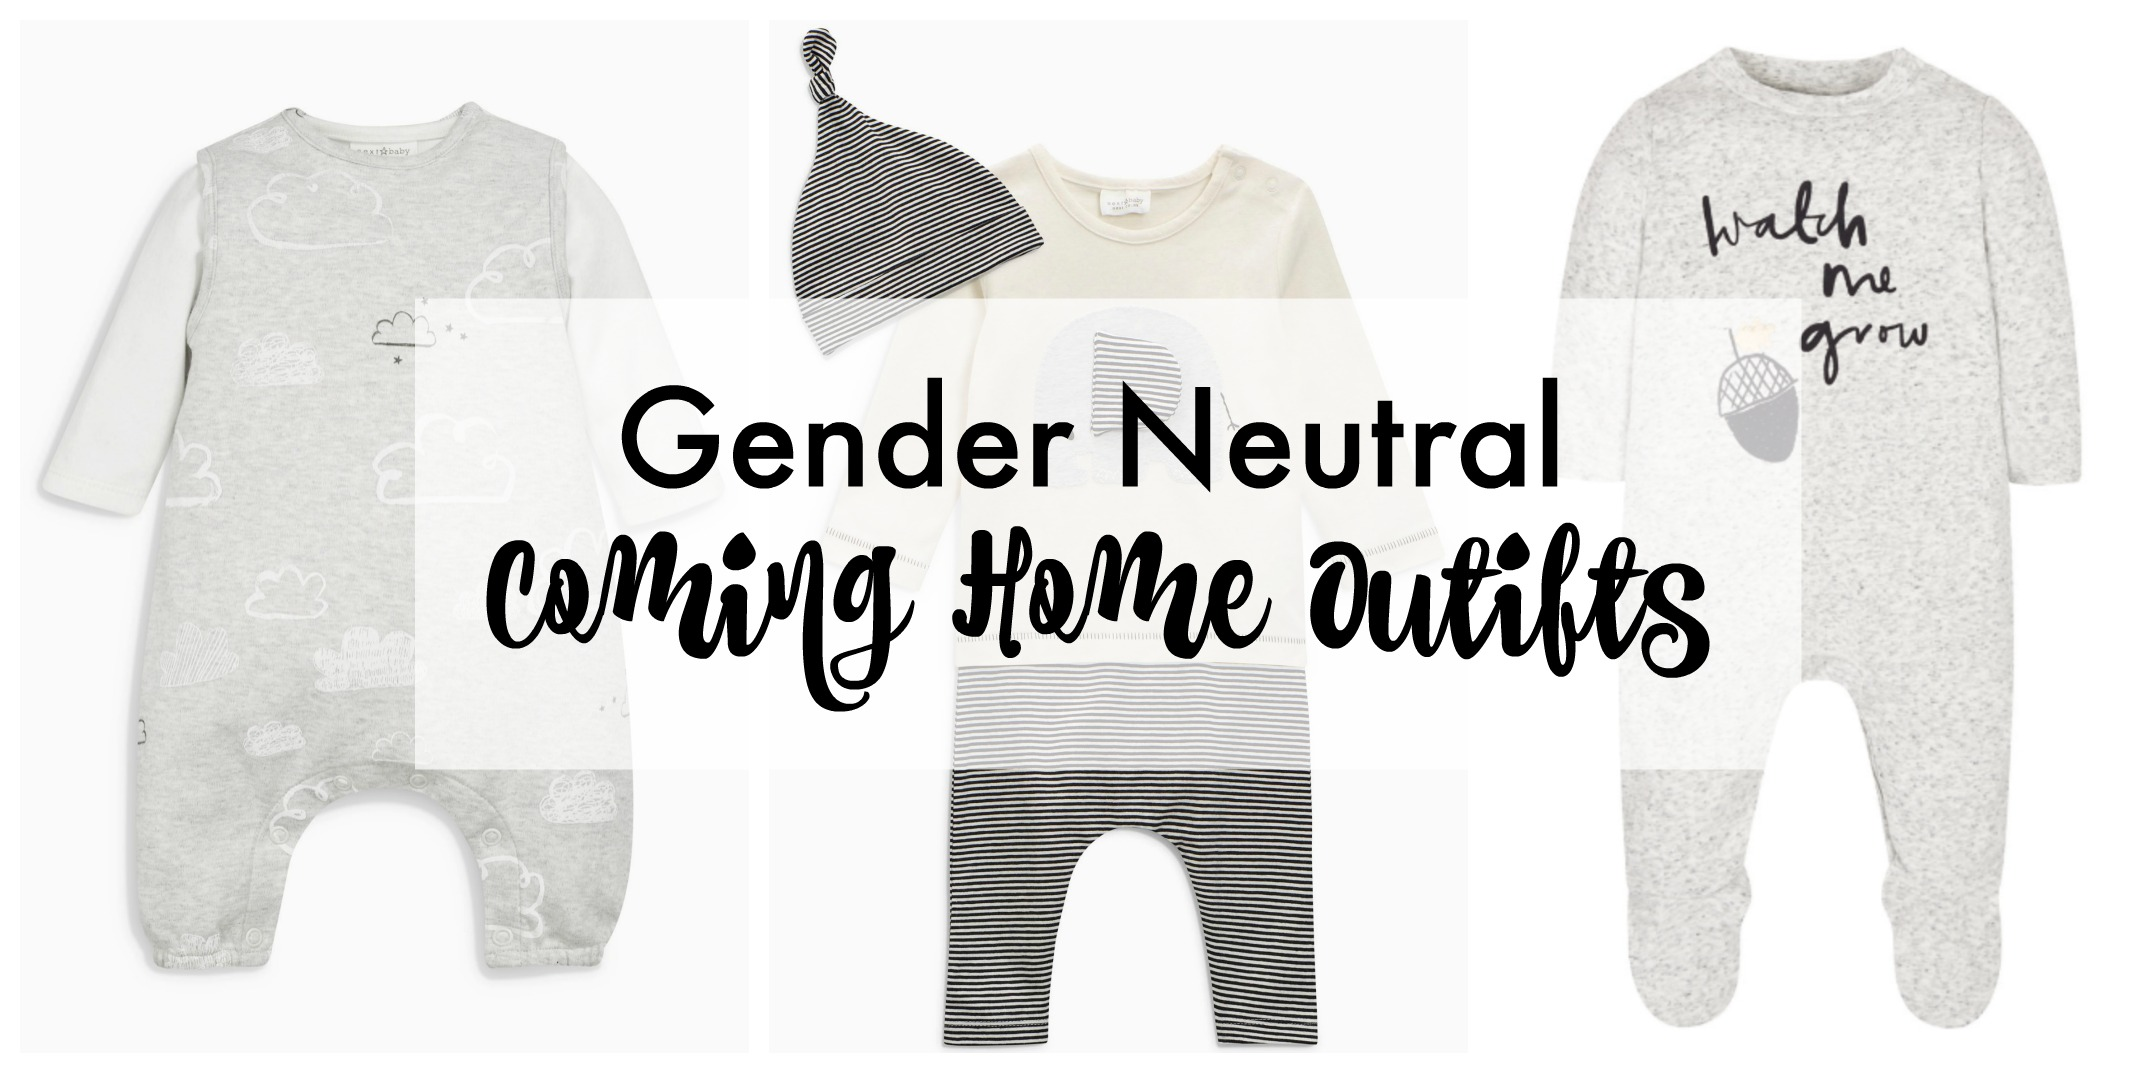 gender neutral title